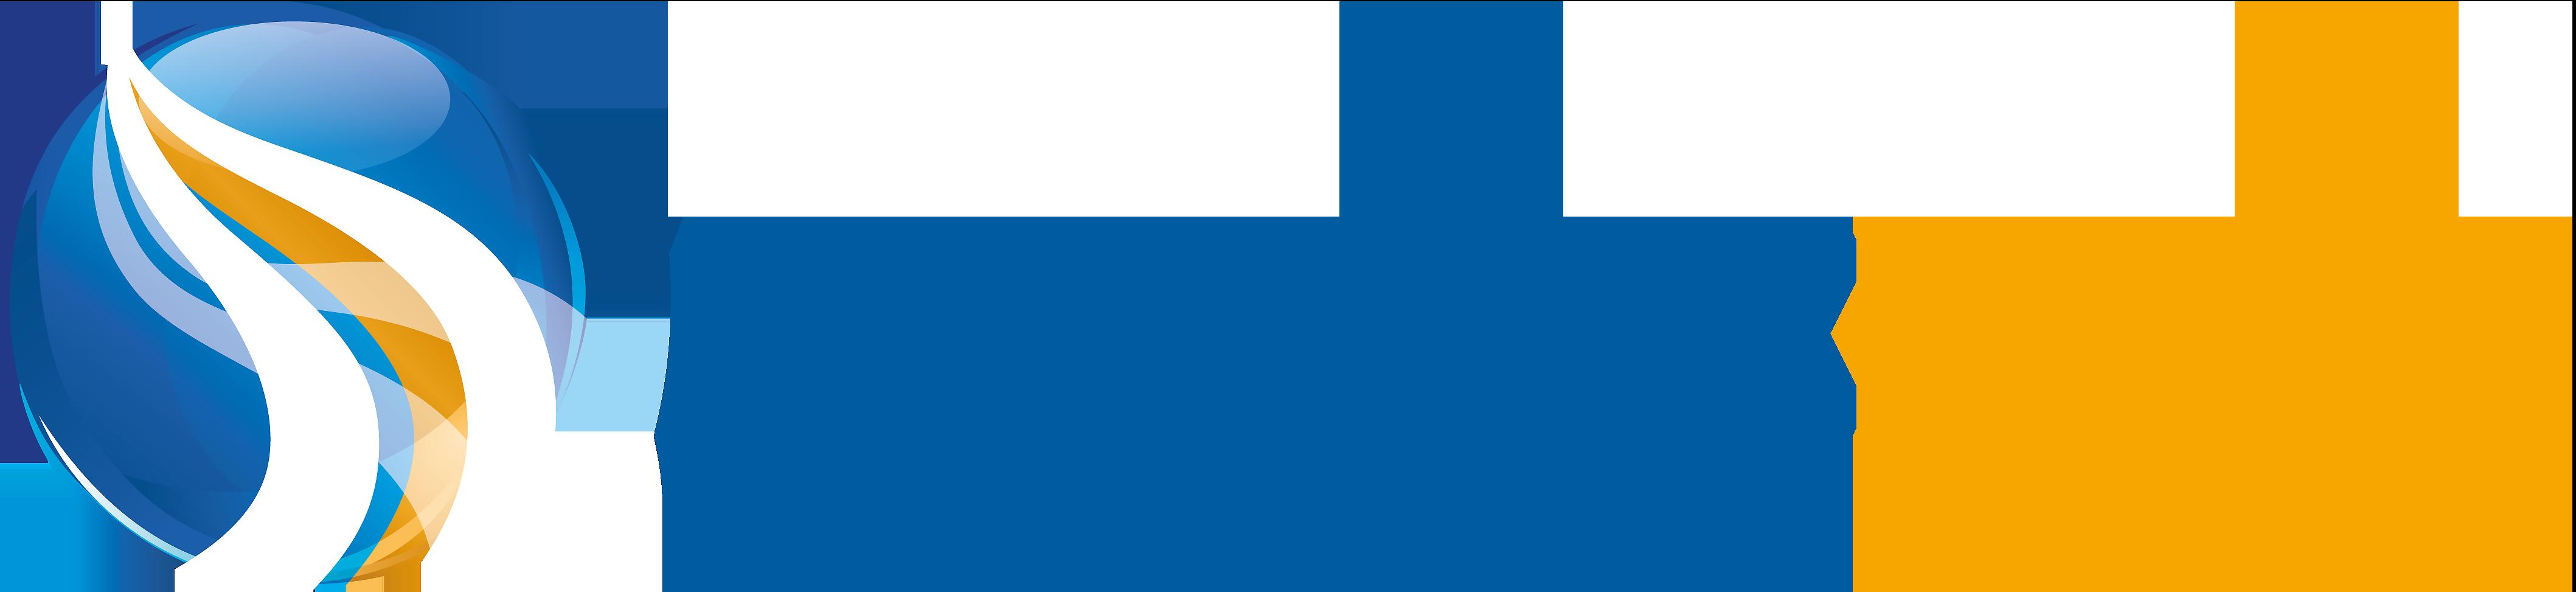 PNG transparant logo MI